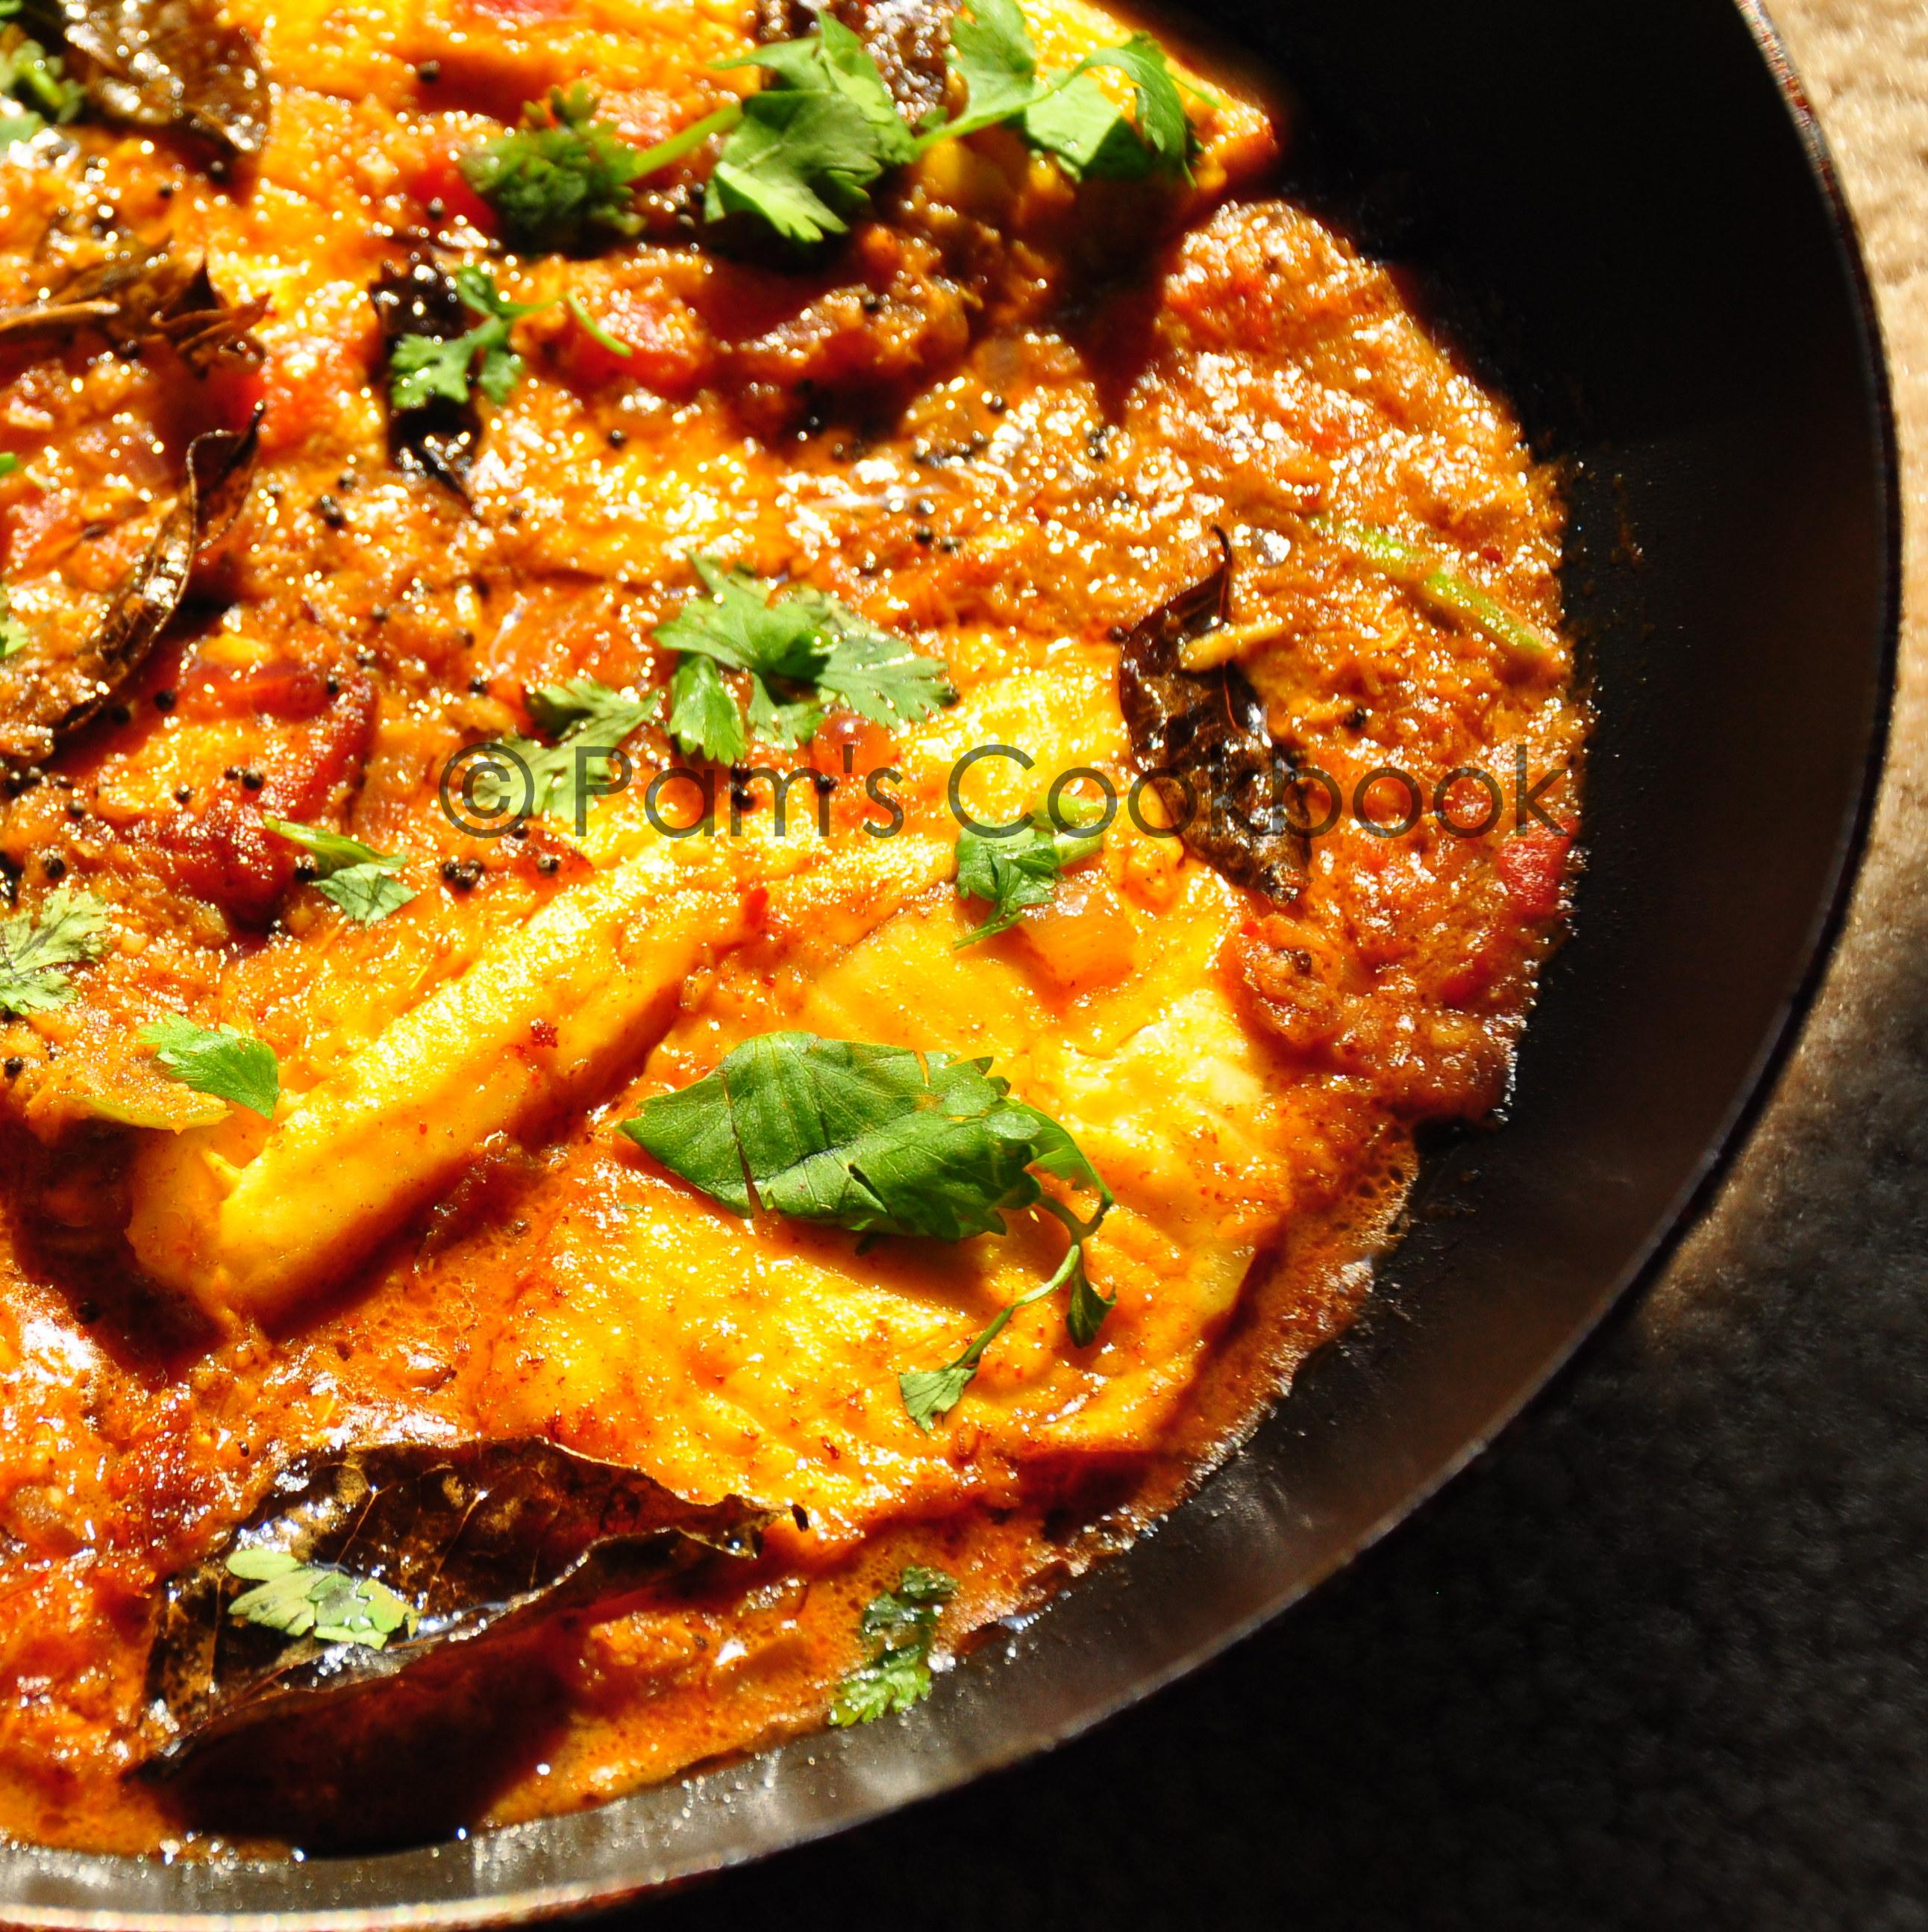 Goan Fish Curry | Pam's Cookbook